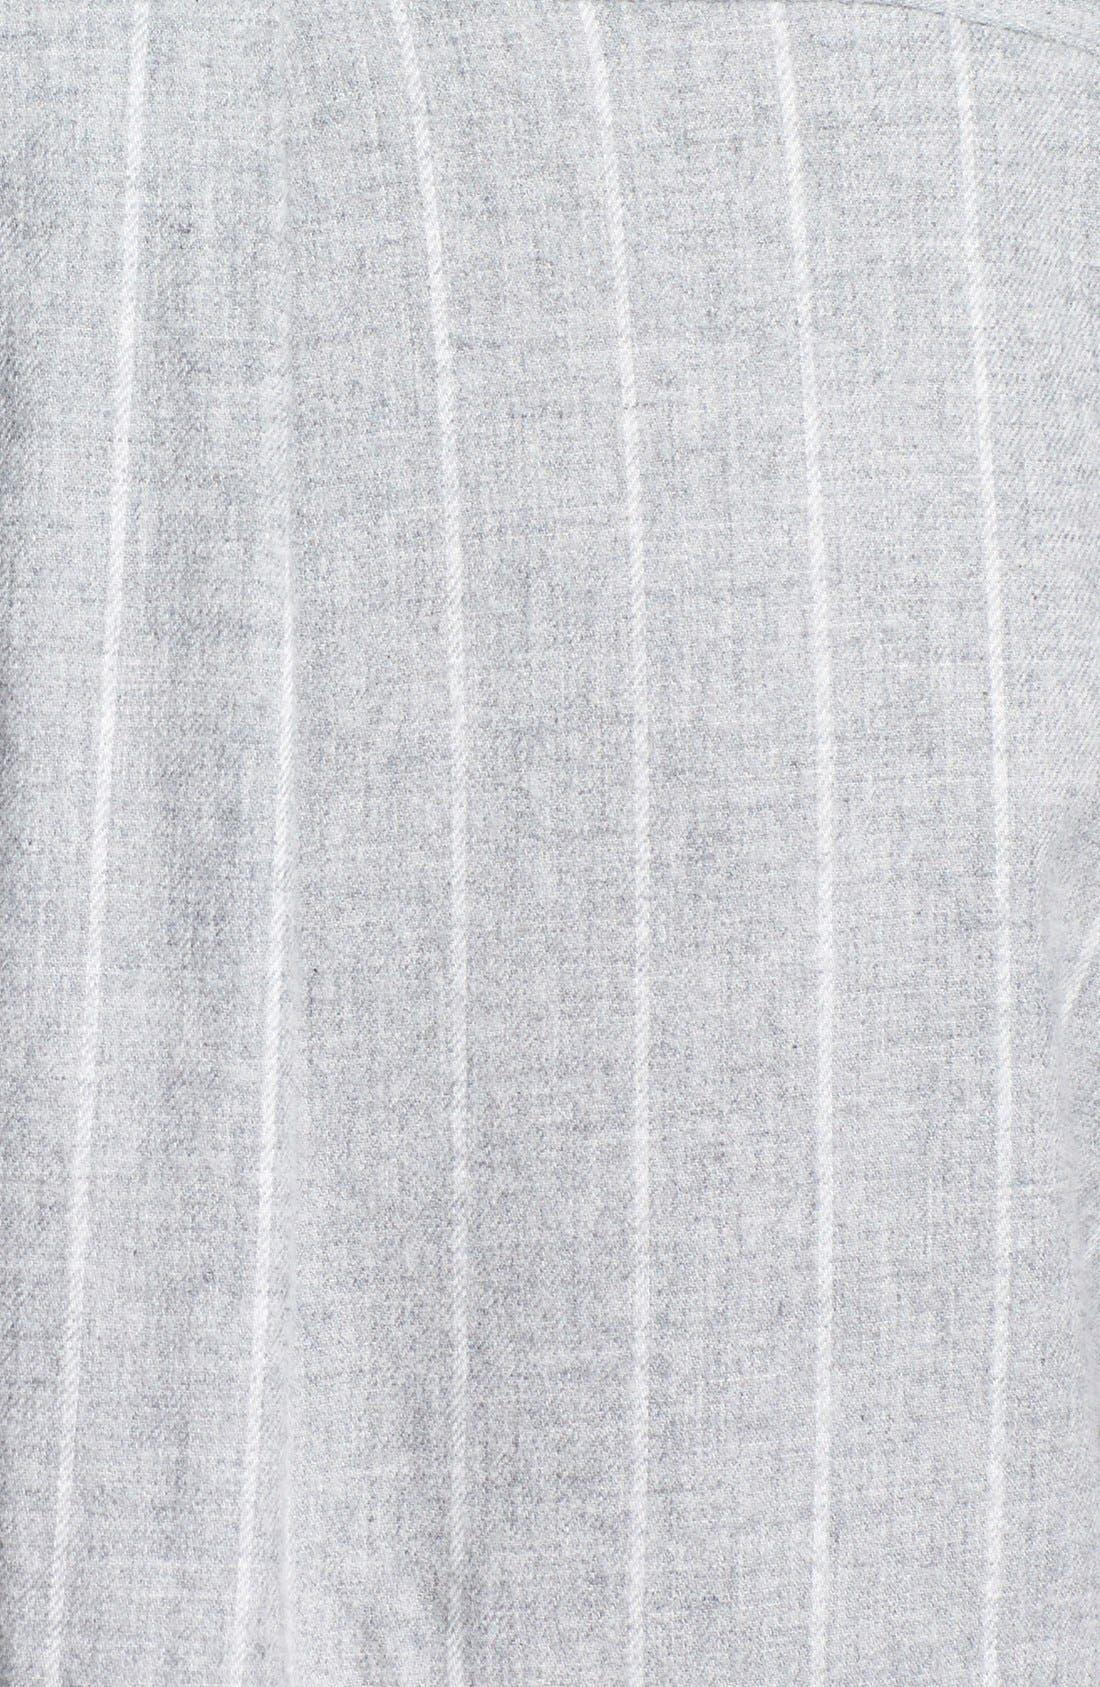 Alternate Image 3  - Lauren Ralph Lauren 'Wicklow' Brushed Twill Sleep Shirt